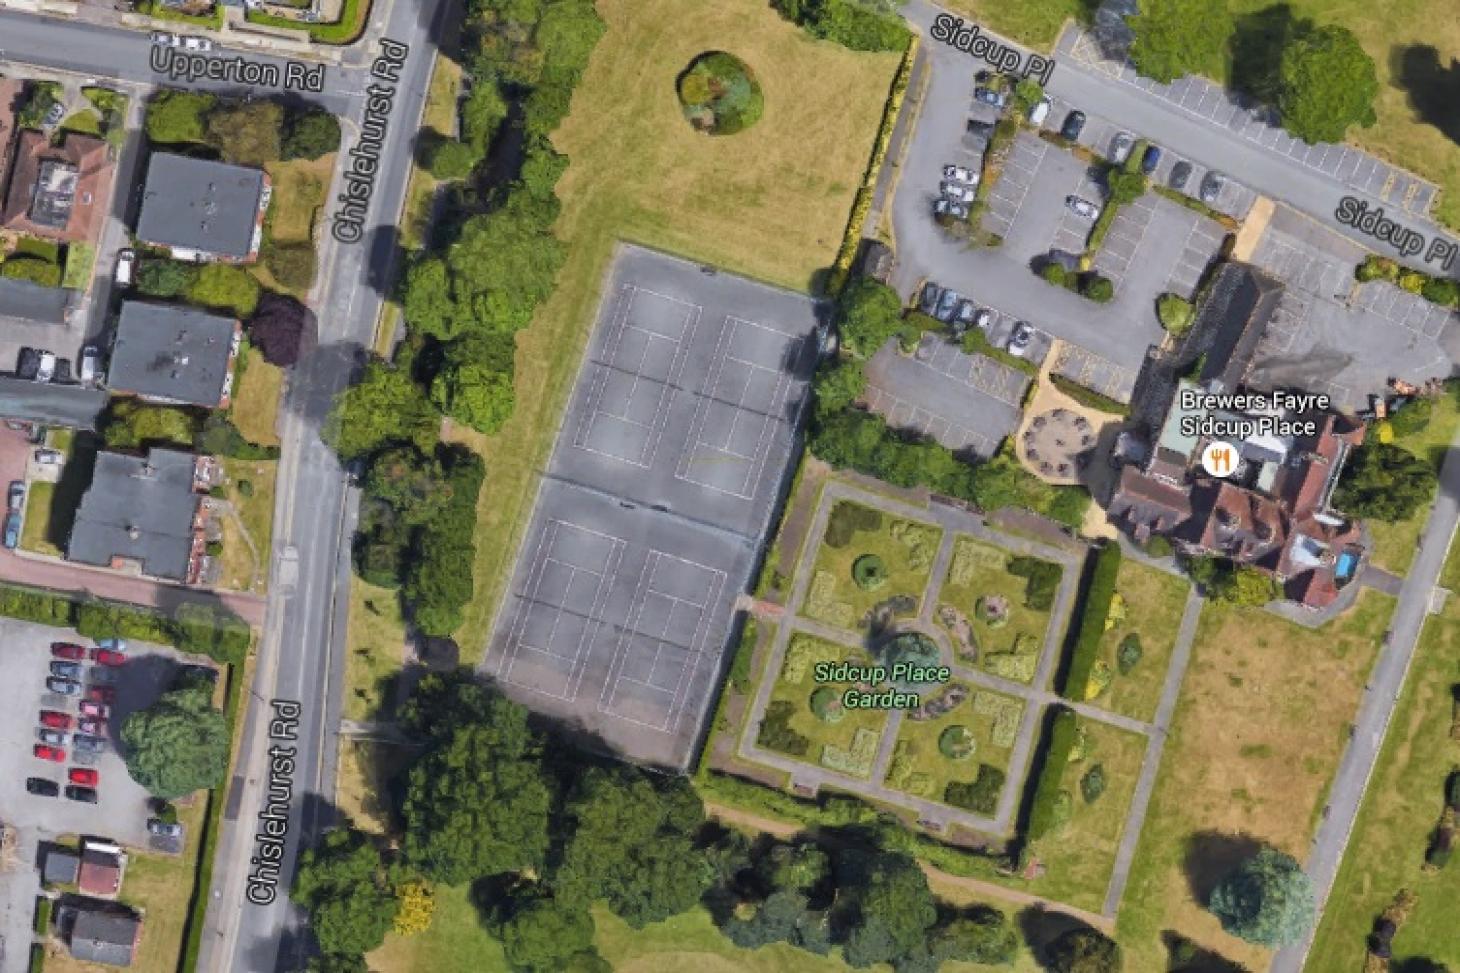 Sidcup Place Outdoor | Hard (macadam) tennis court